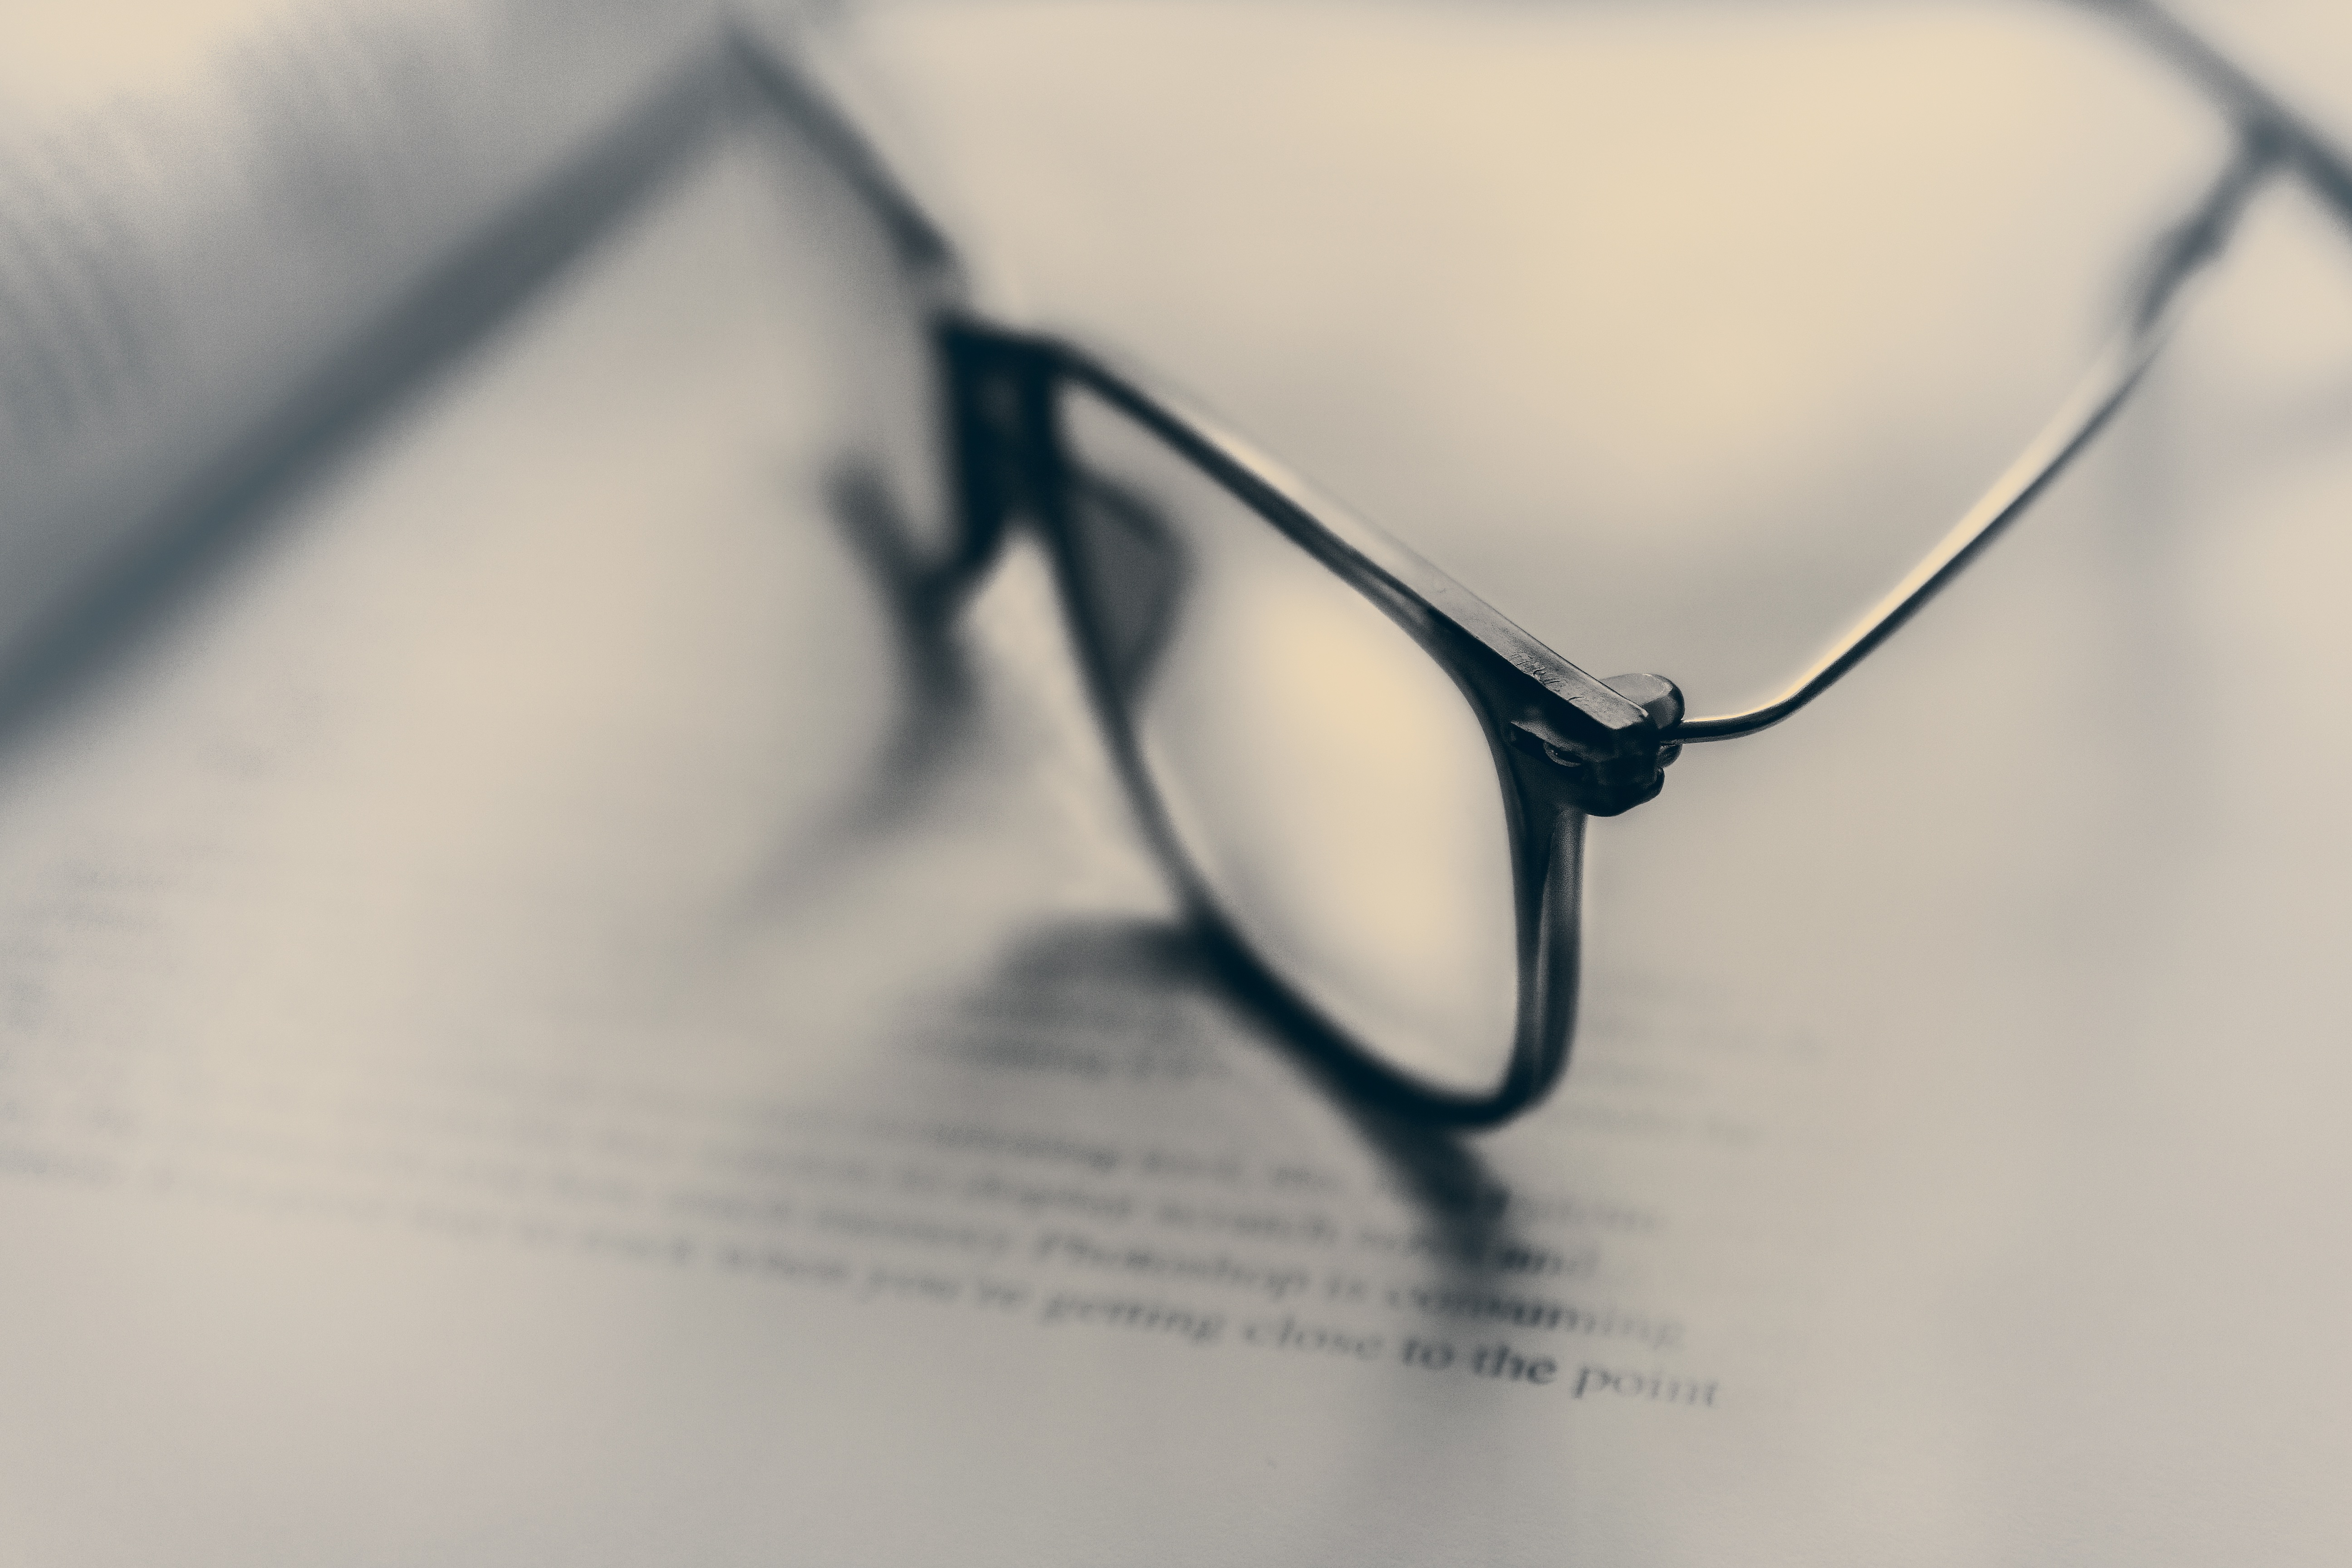 agency vision